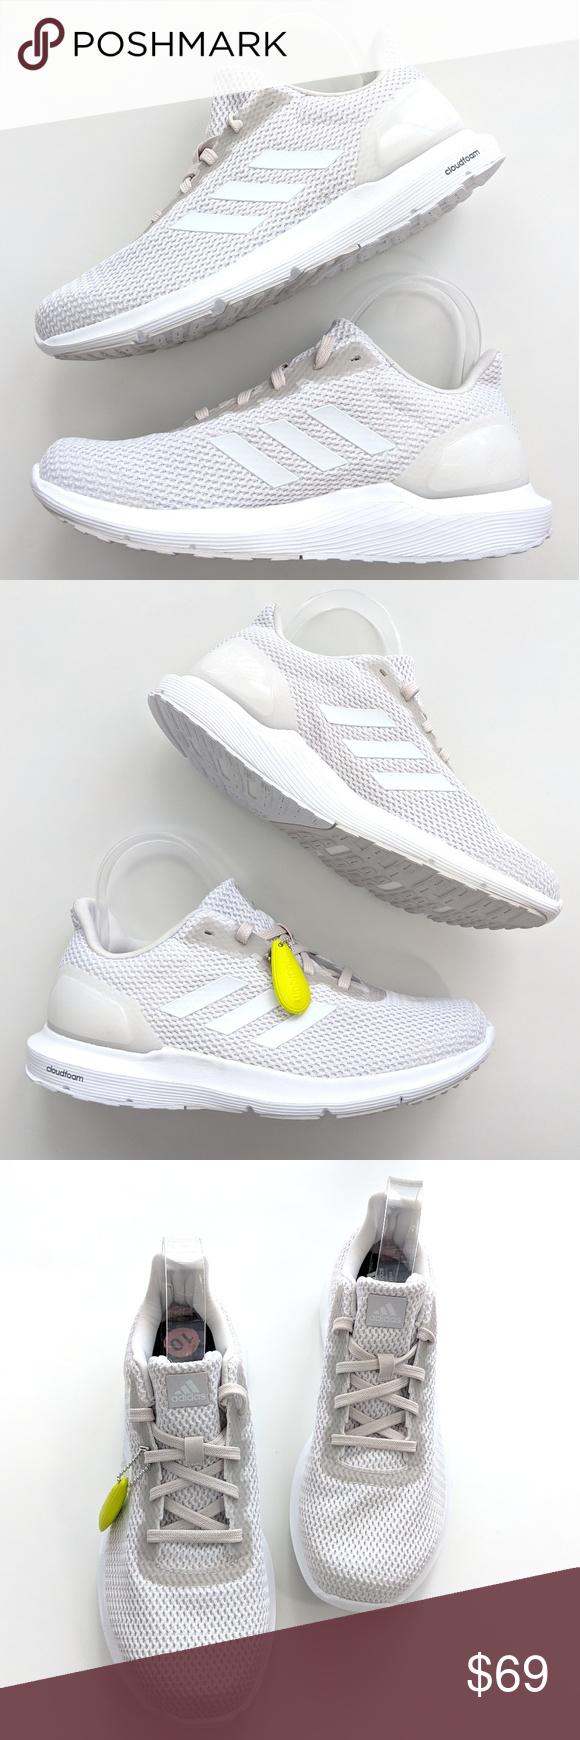 NEW Adidas Cloudfoam Ortholite Running